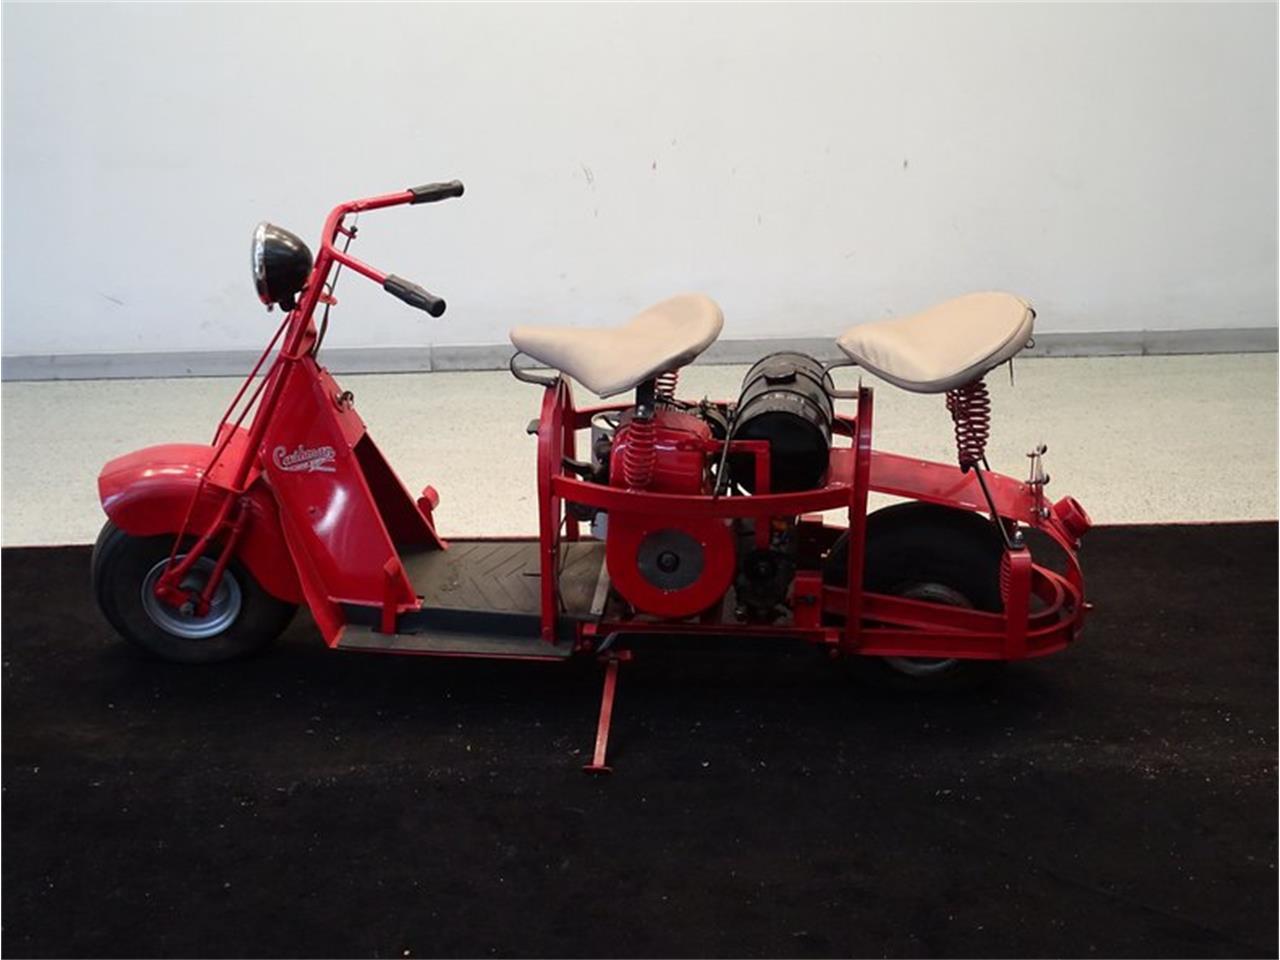 1947 Cushman Scooter (CC-1389535) for sale in Greensboro, North Carolina